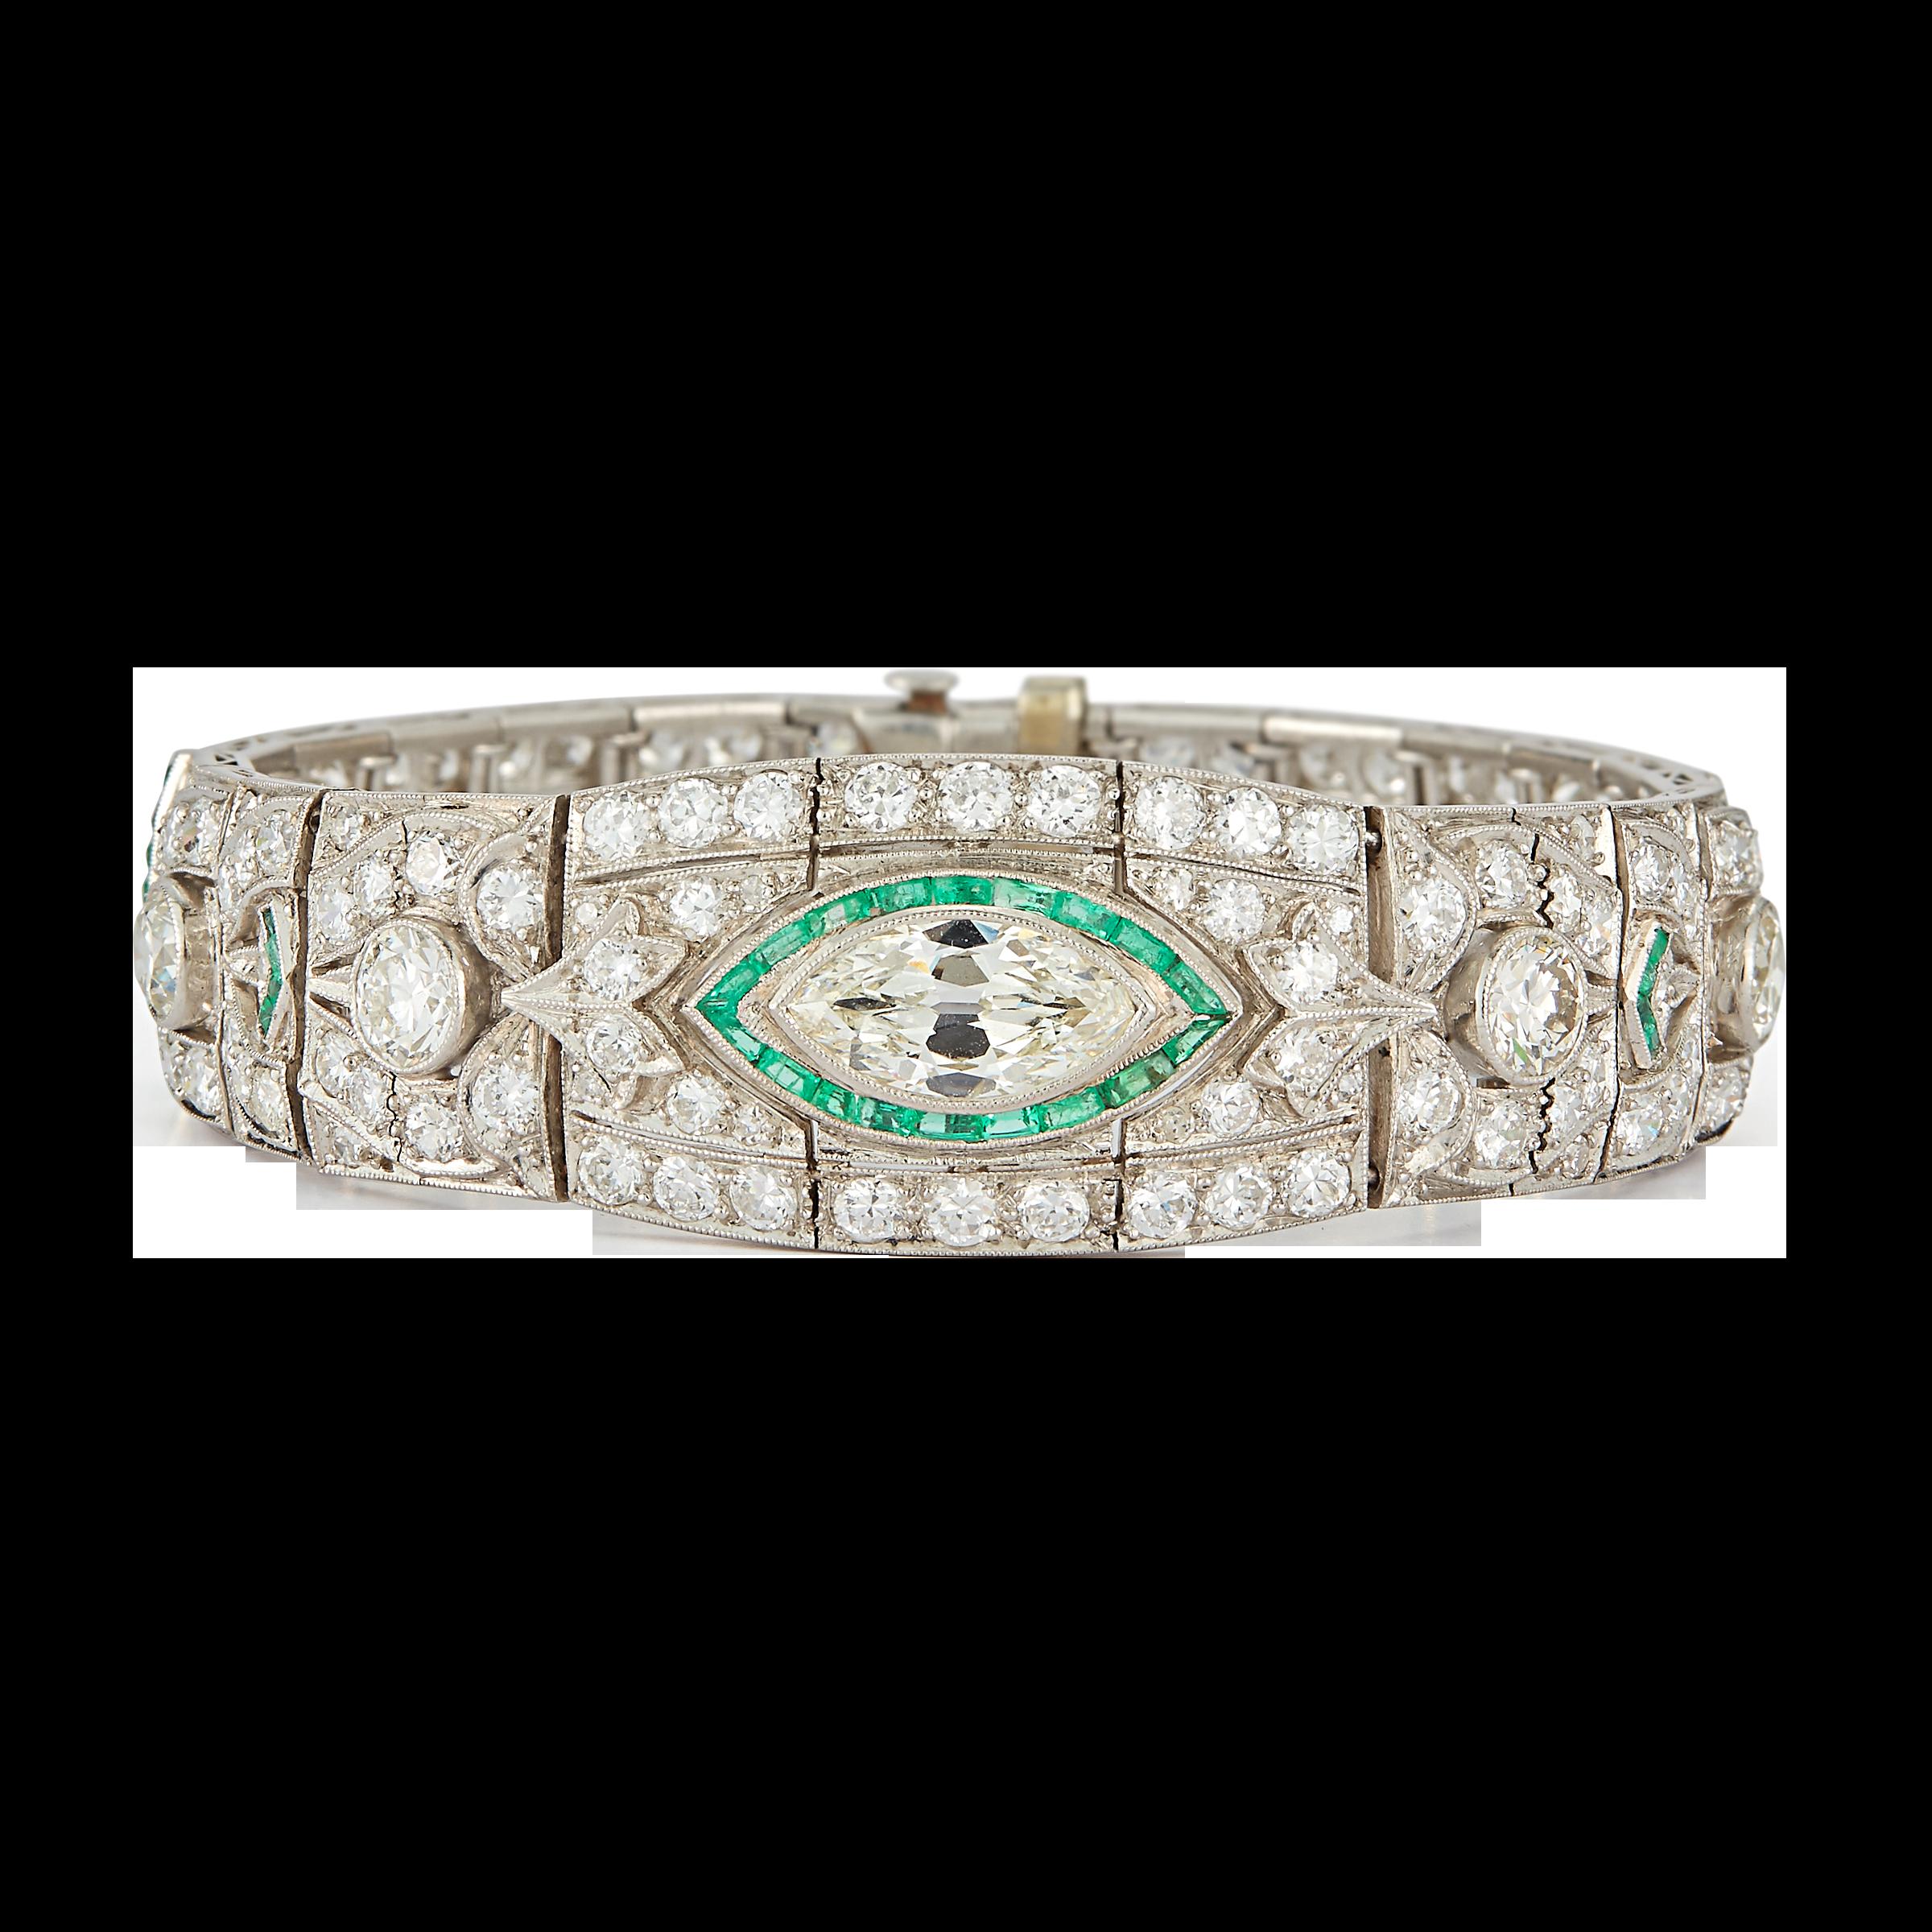 art-deco-emerald-and-diamond-bracelet-edd3